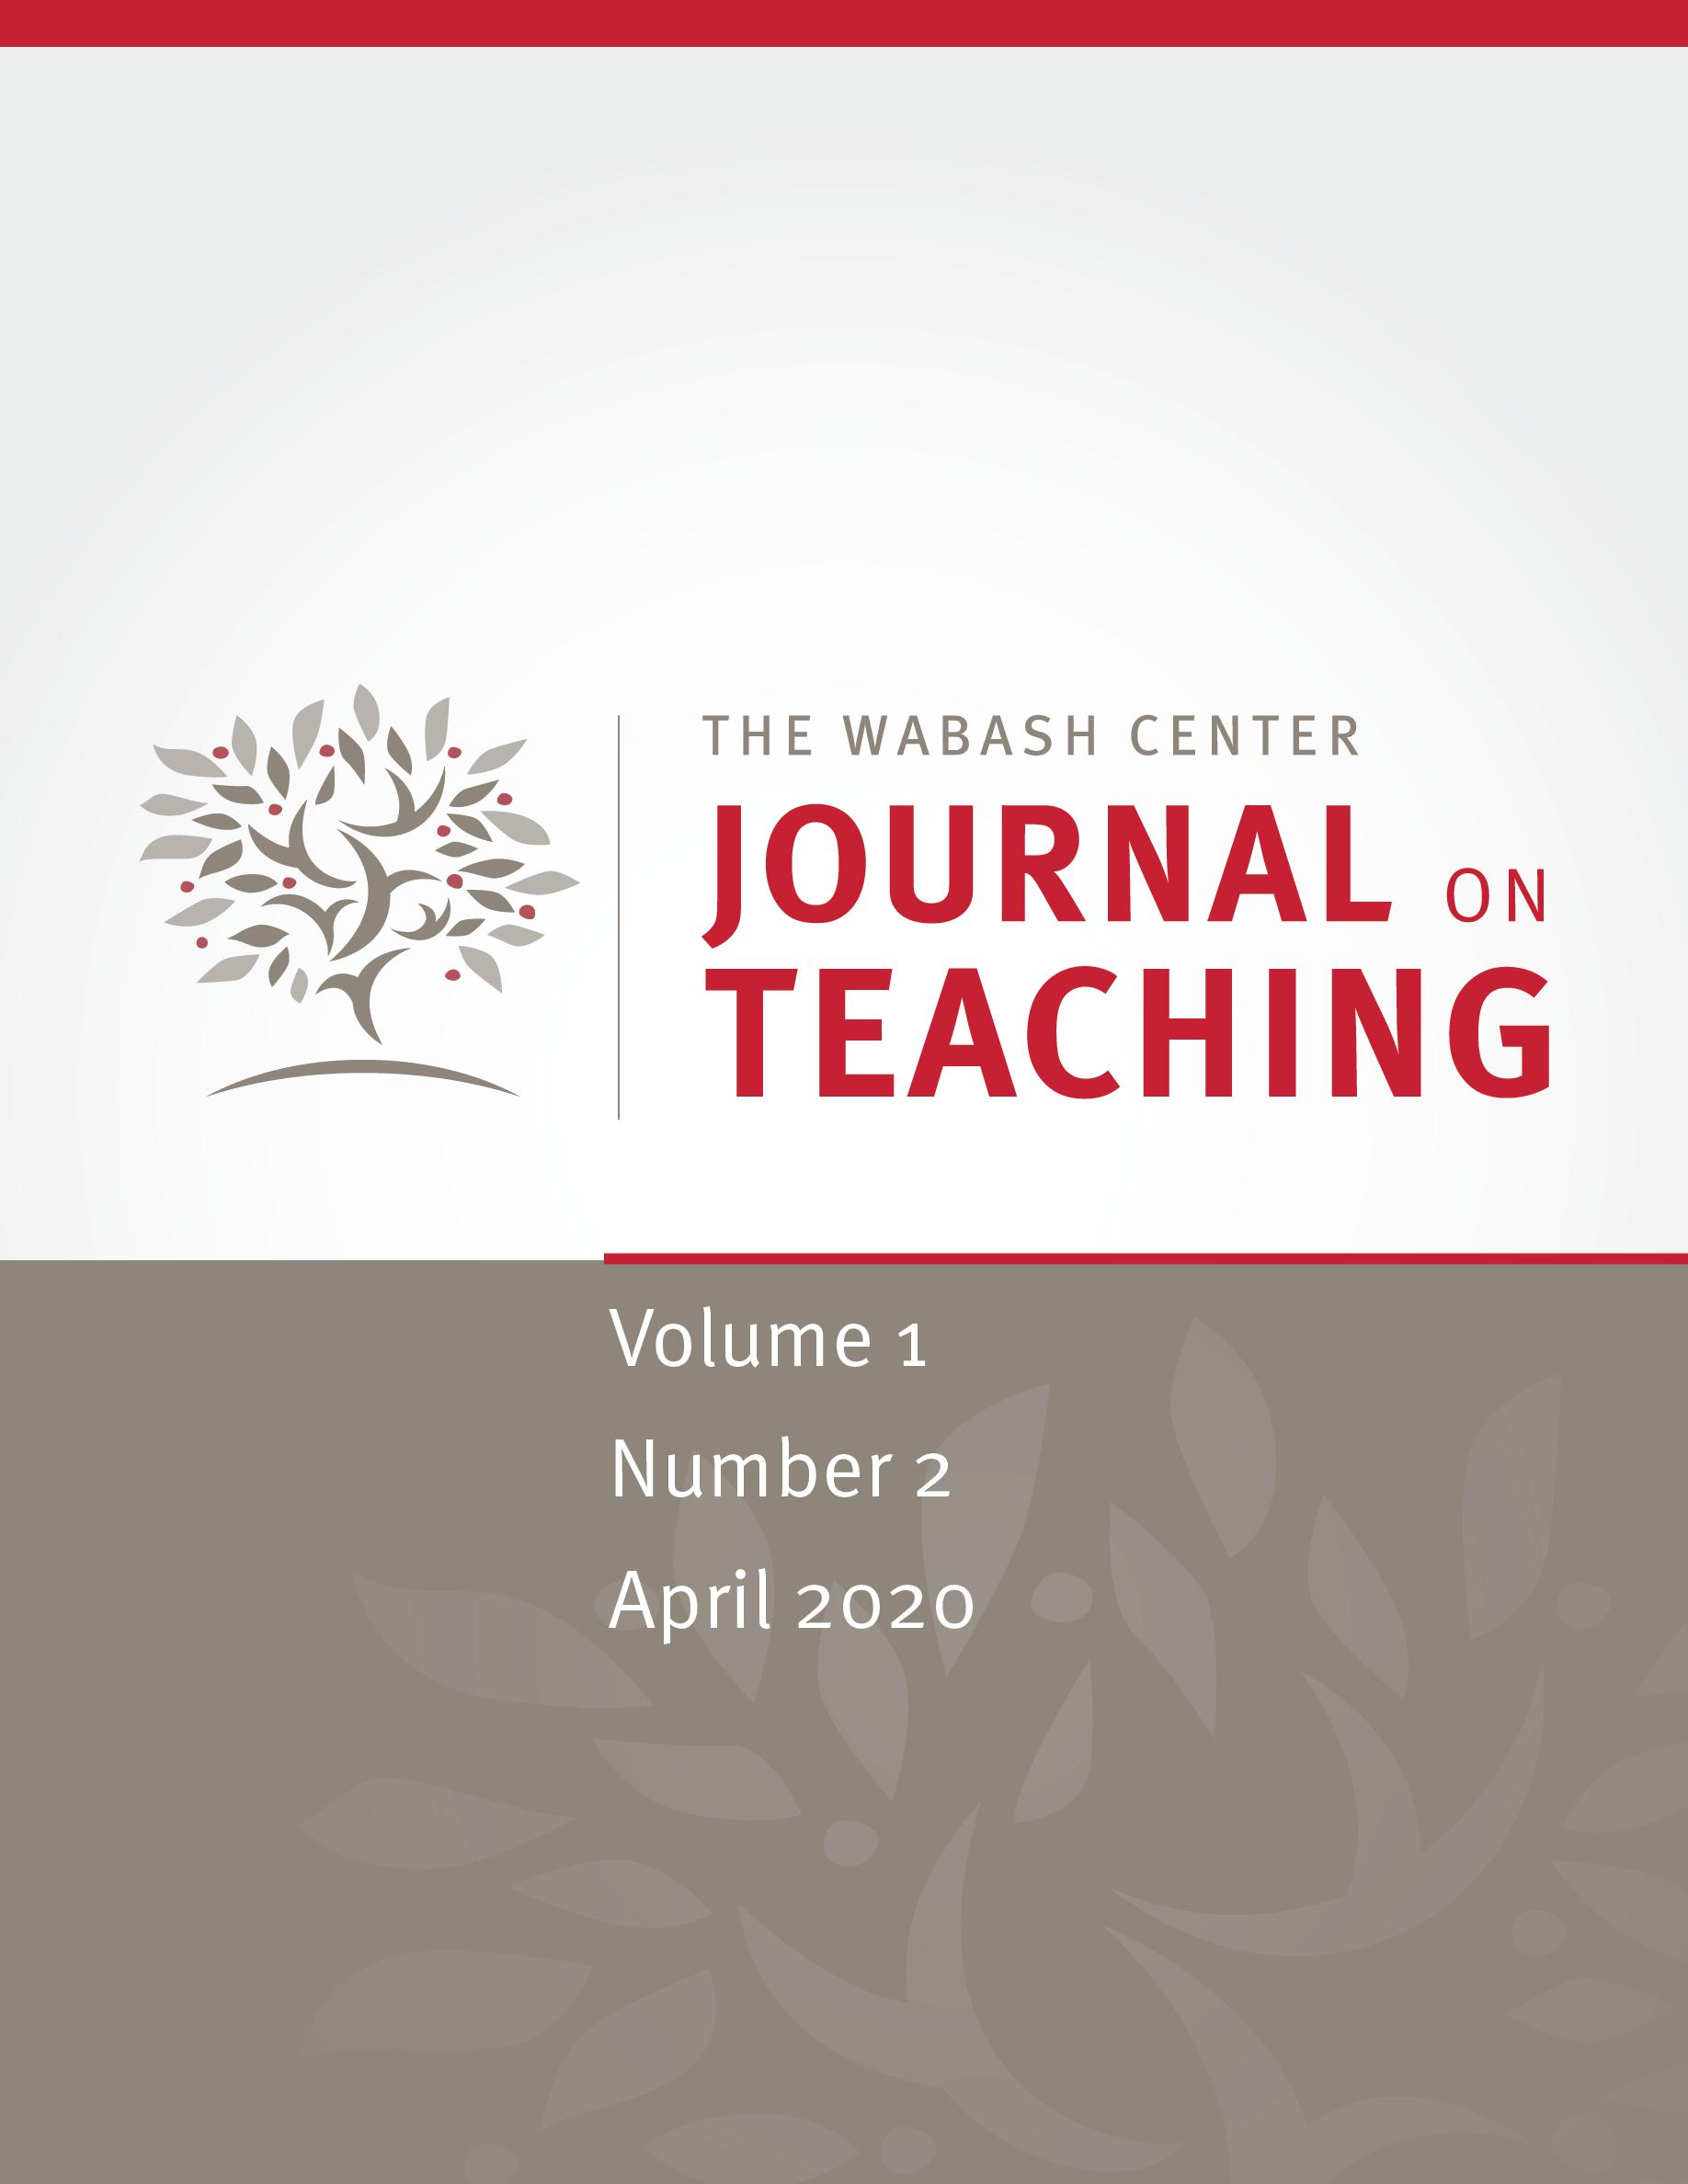 JoT volume 1, issue 2 (April 2020)